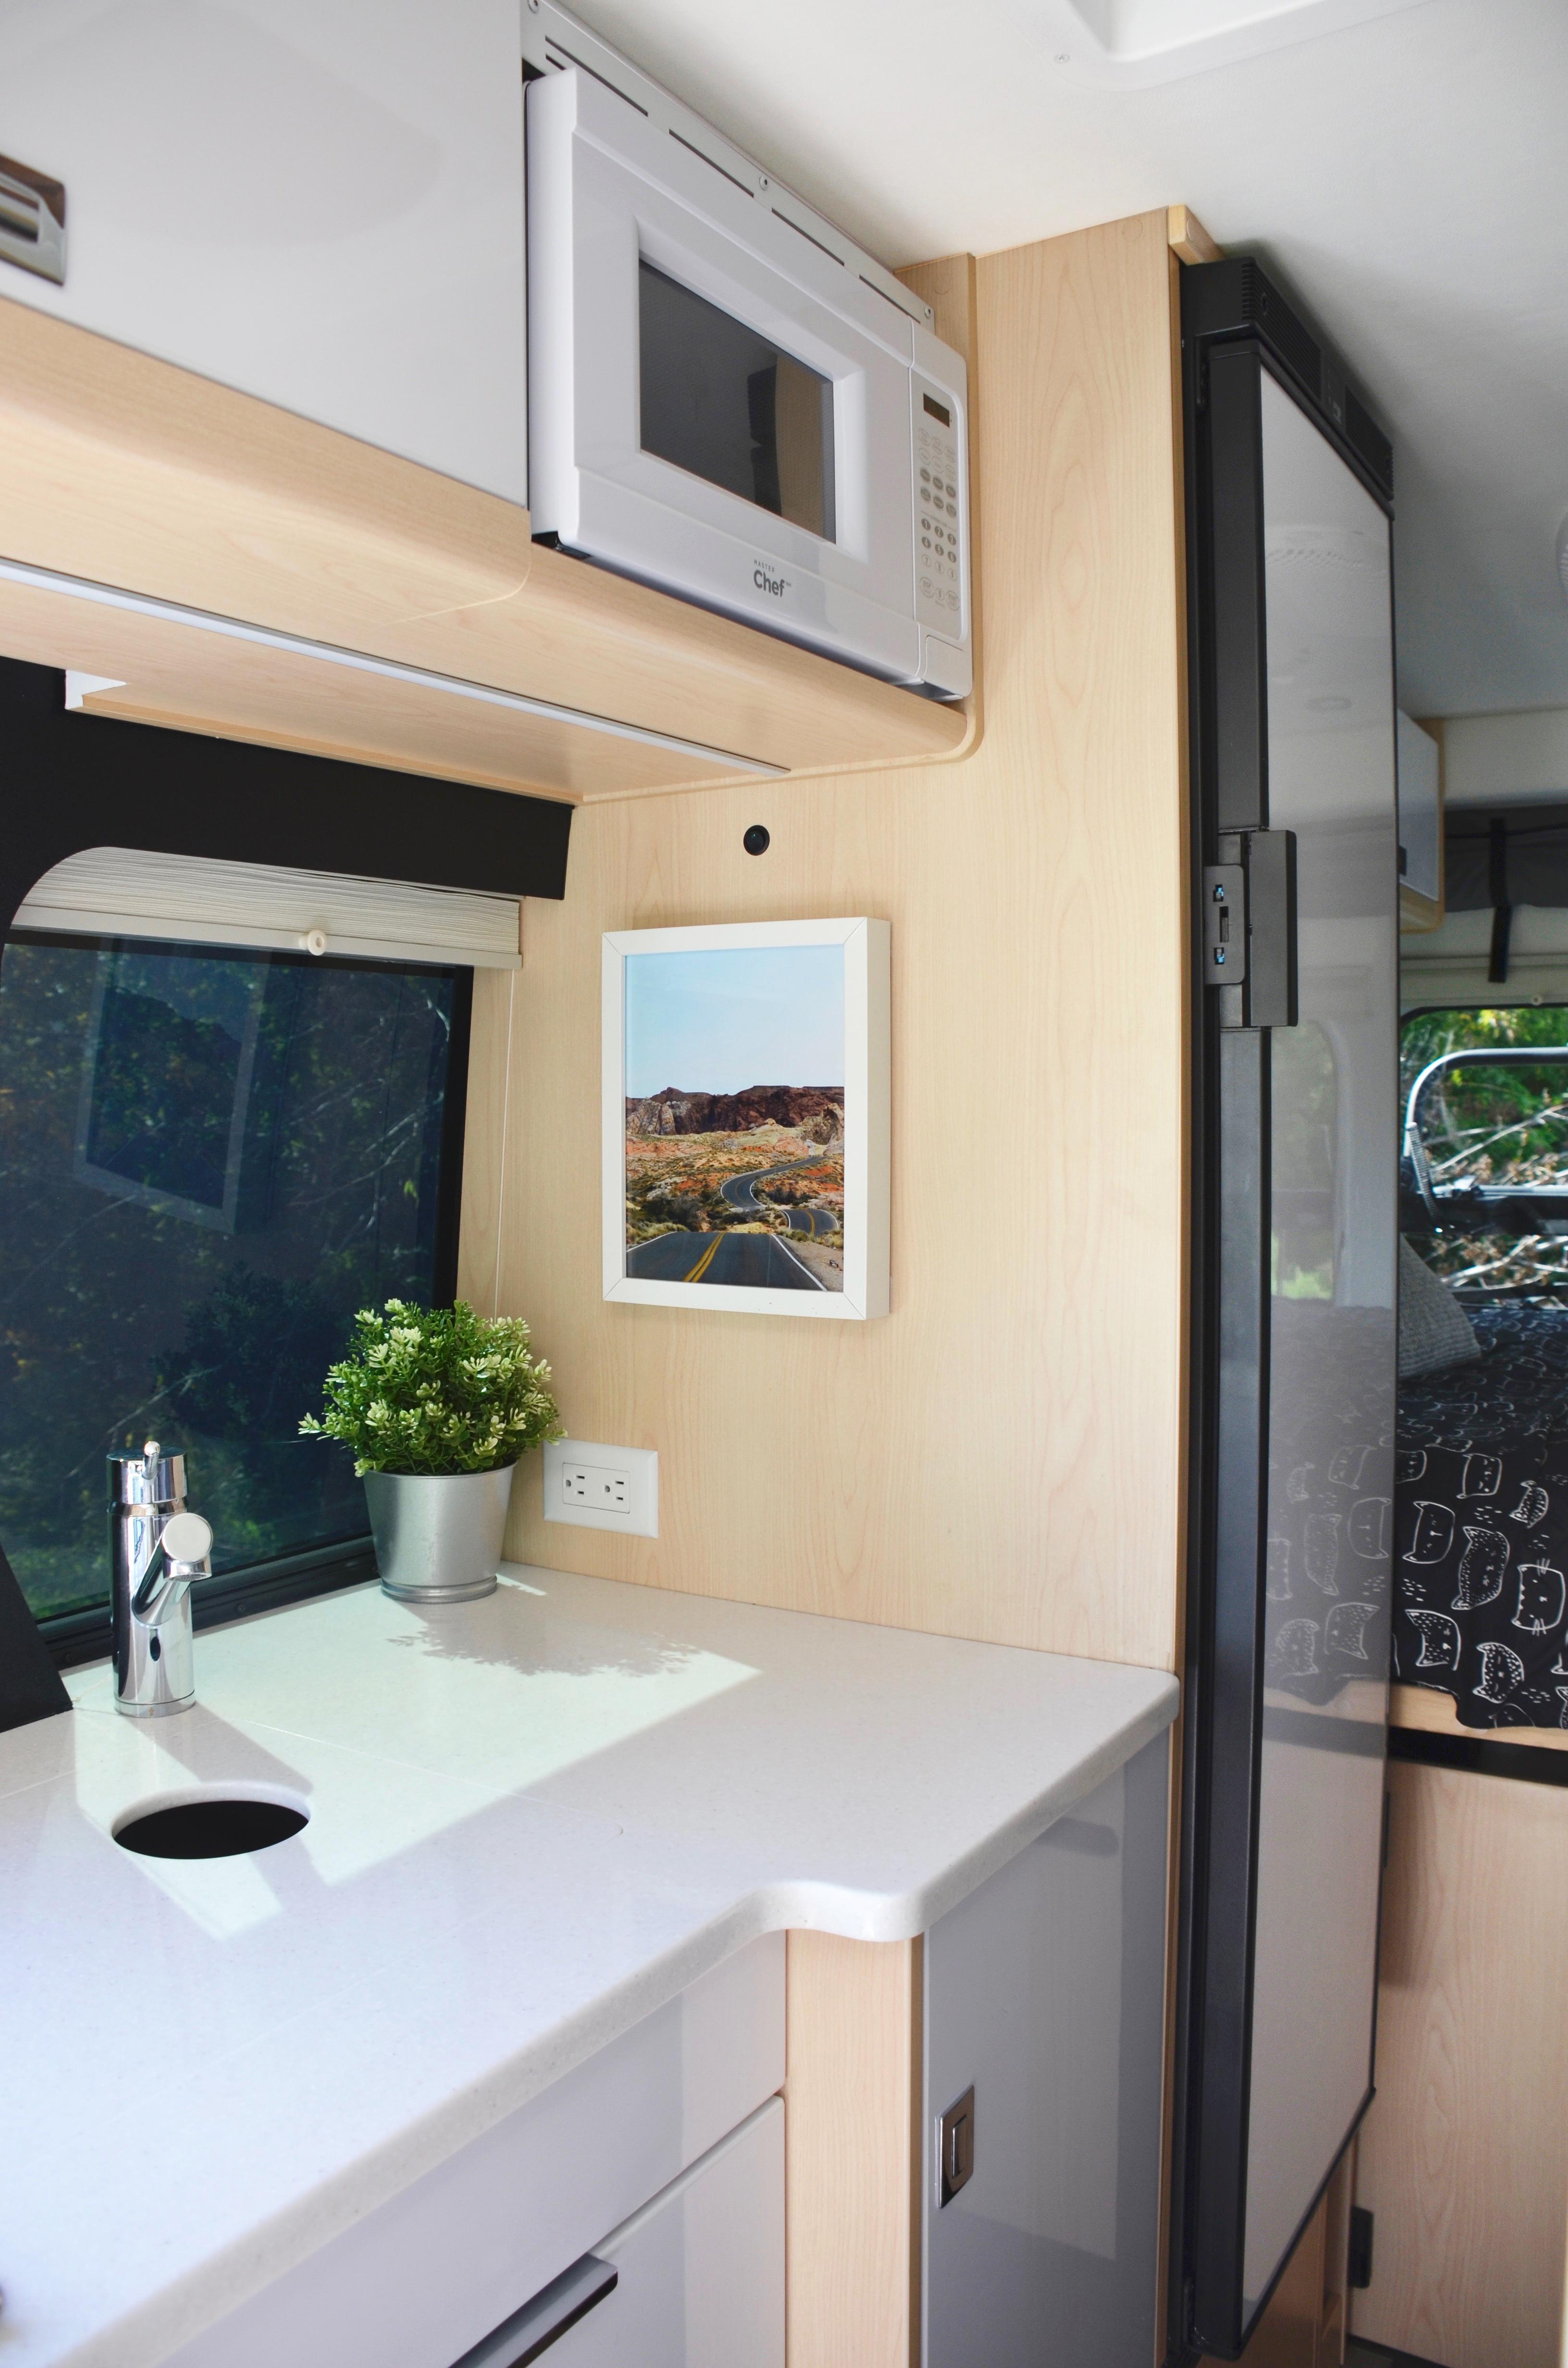 Panoramic RV - Compressor fridge - 1